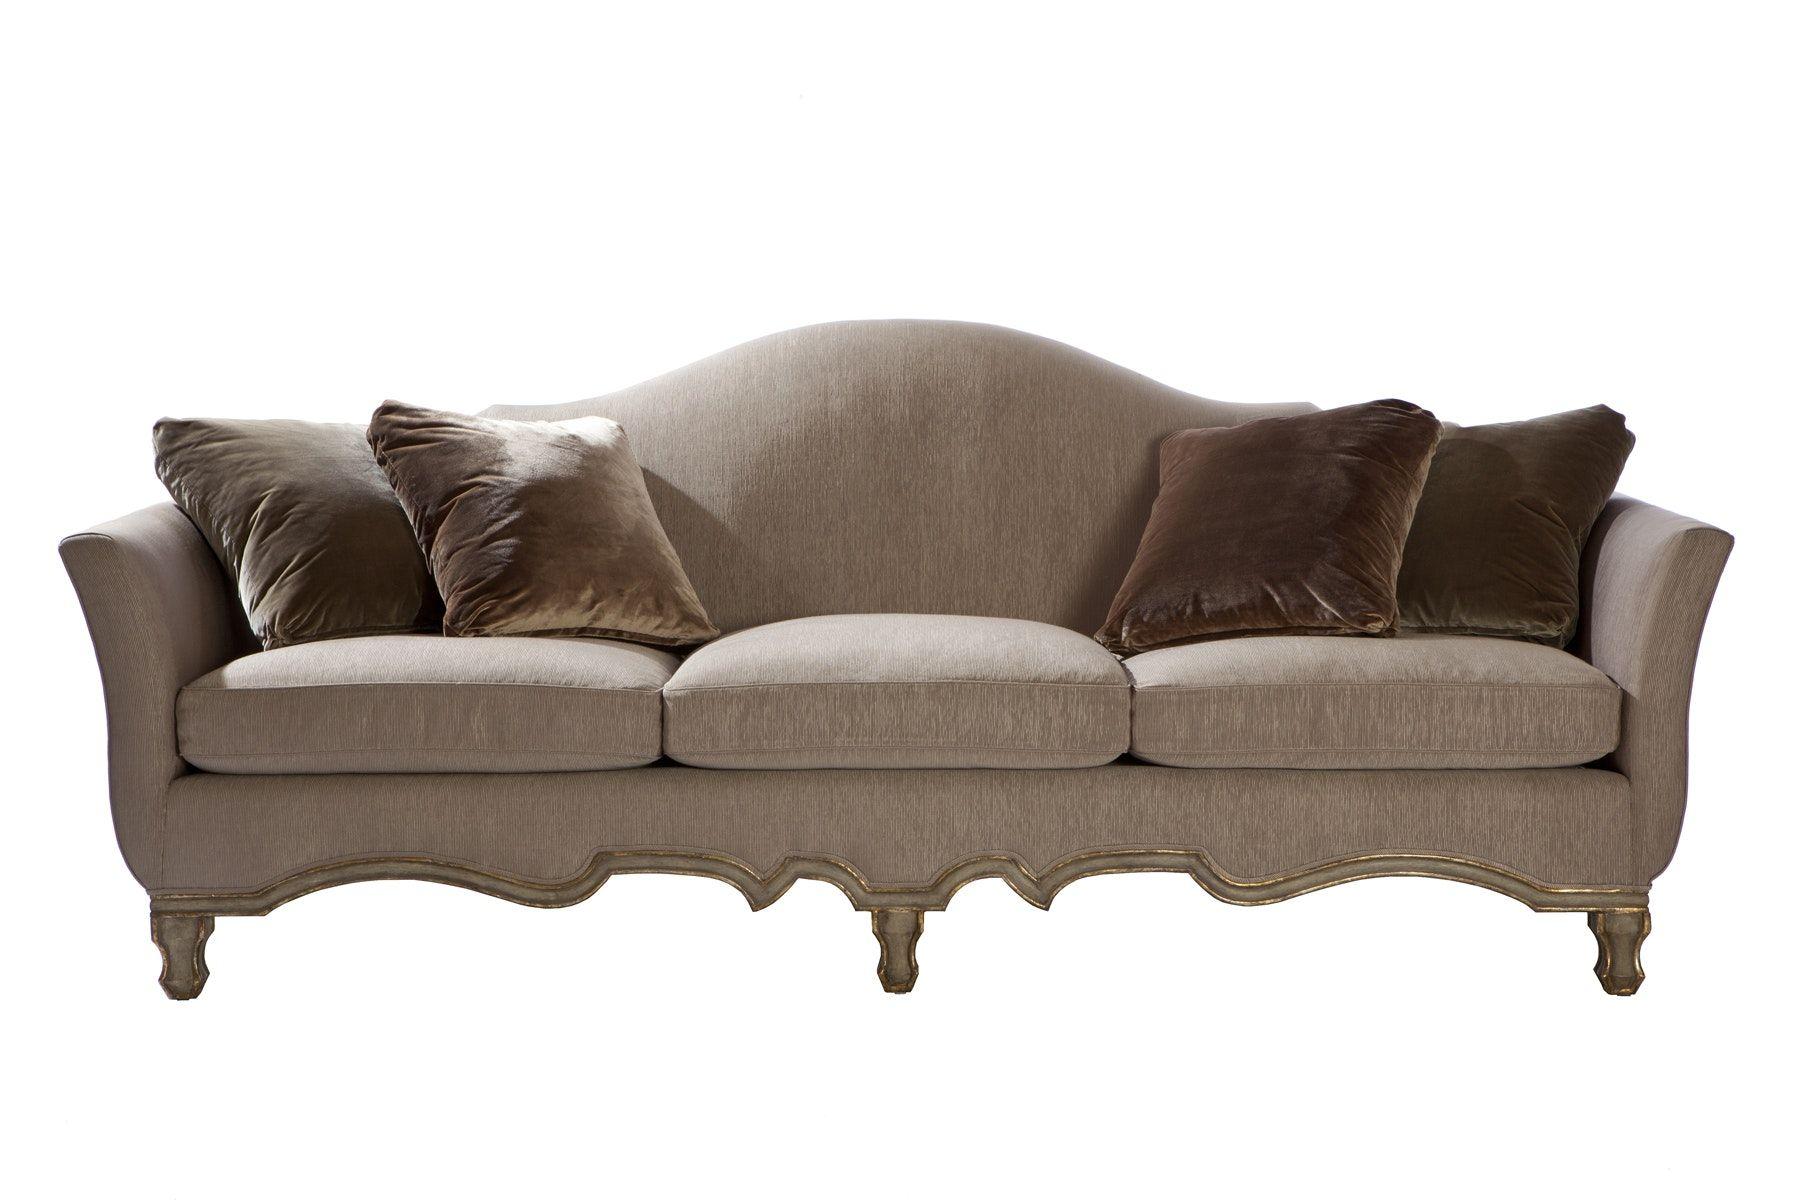 Buy Borghese Sofa by Ebanista Made to Order designer Furniture